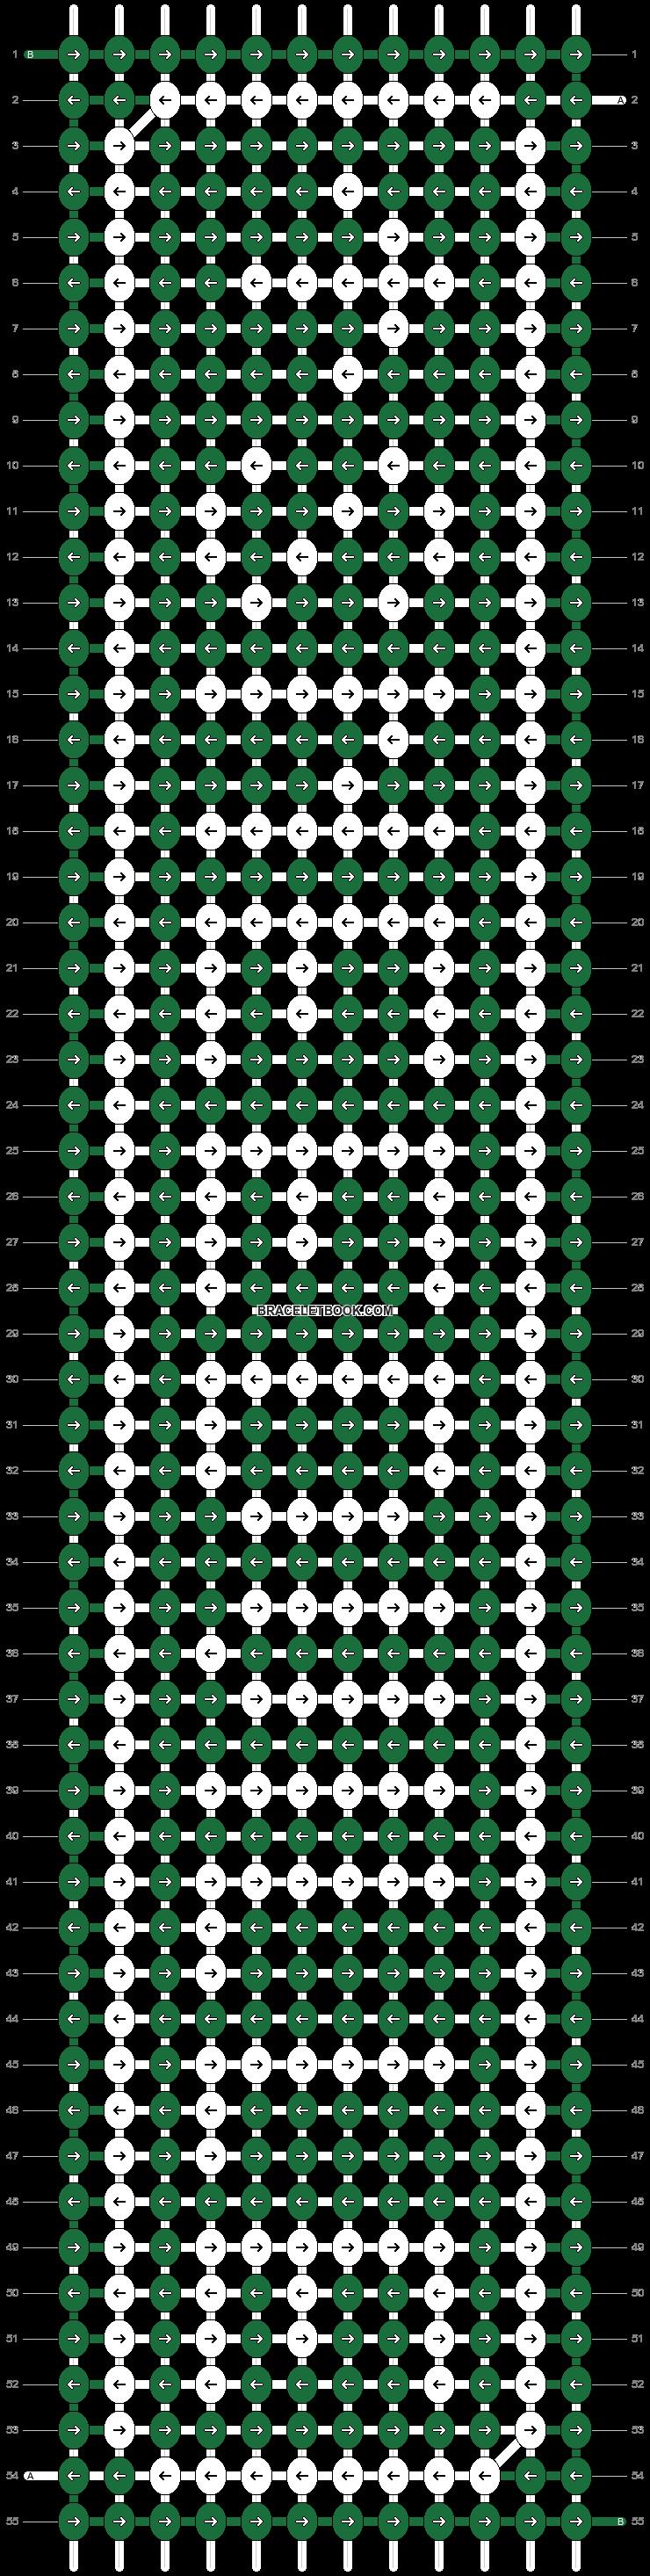 Alpha pattern #46787 variation #113626 pattern